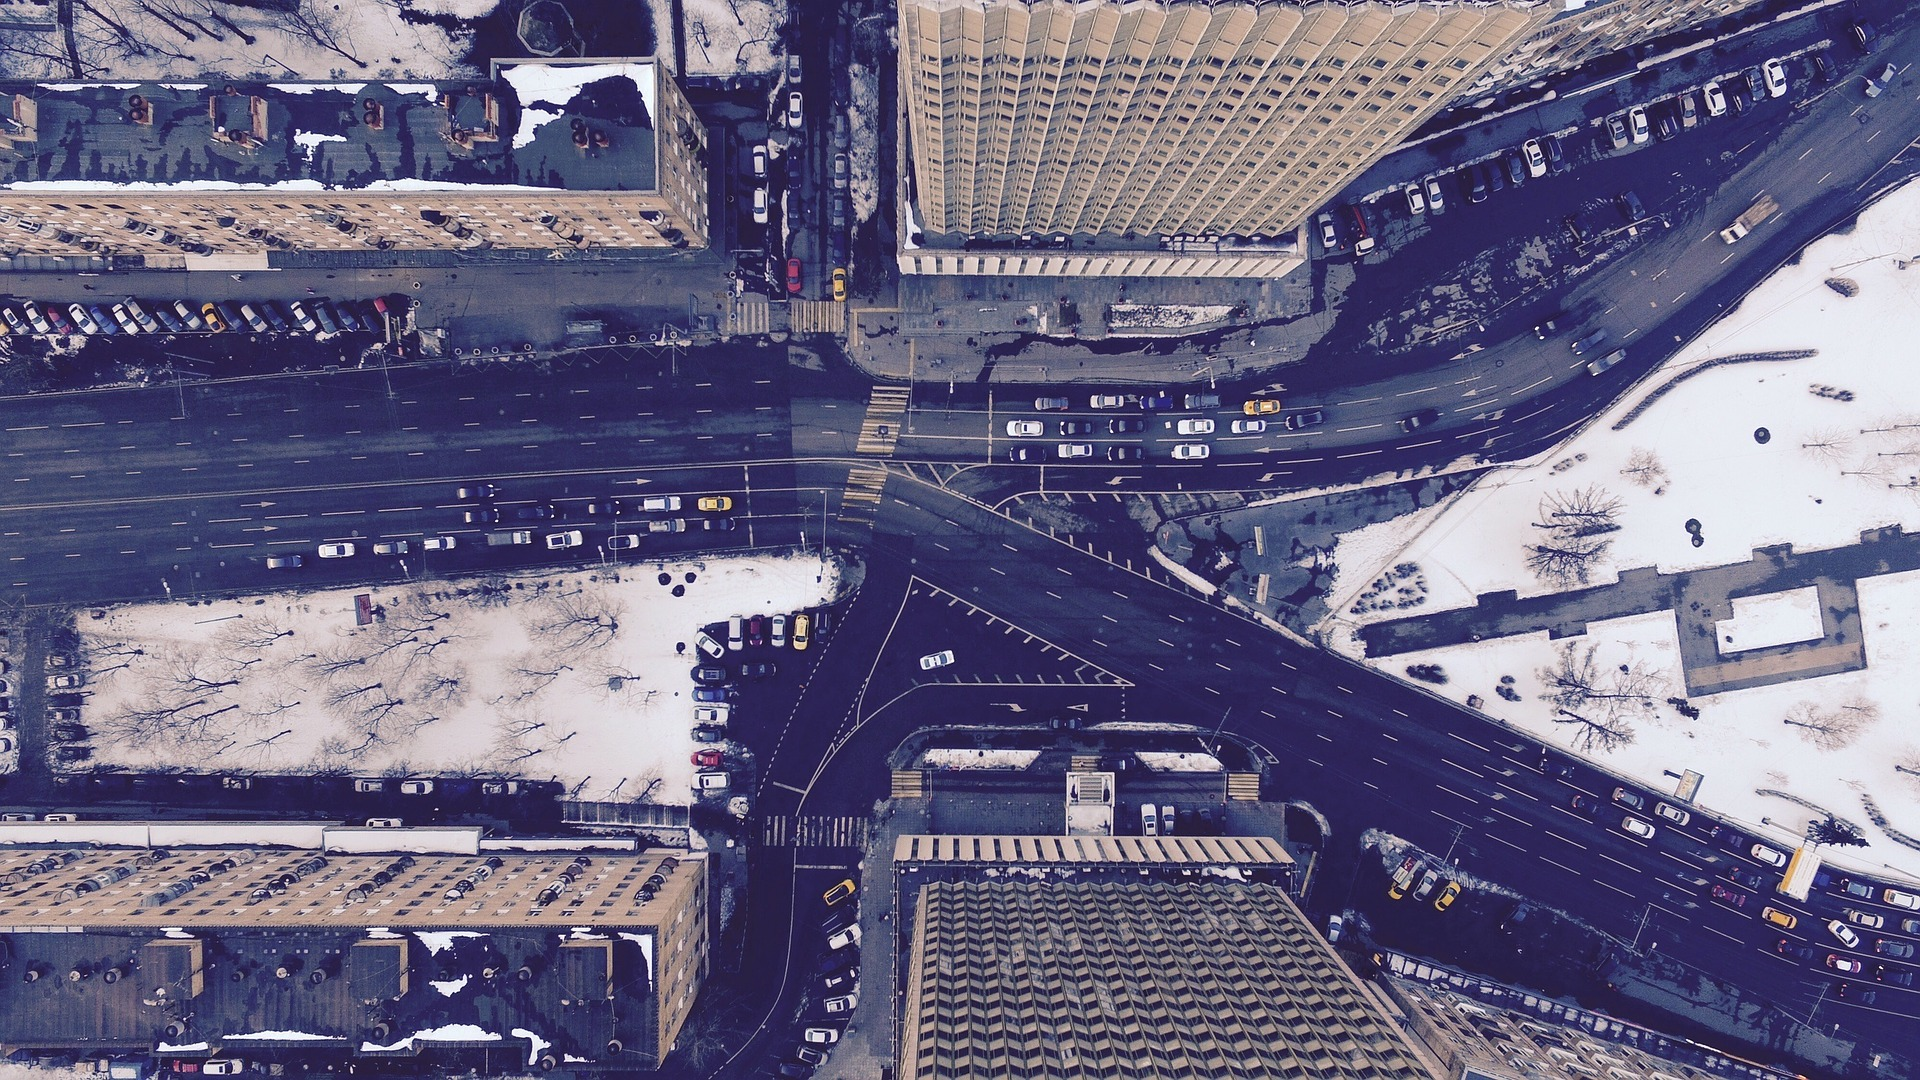 public works operations, telematics, snow, zenduit